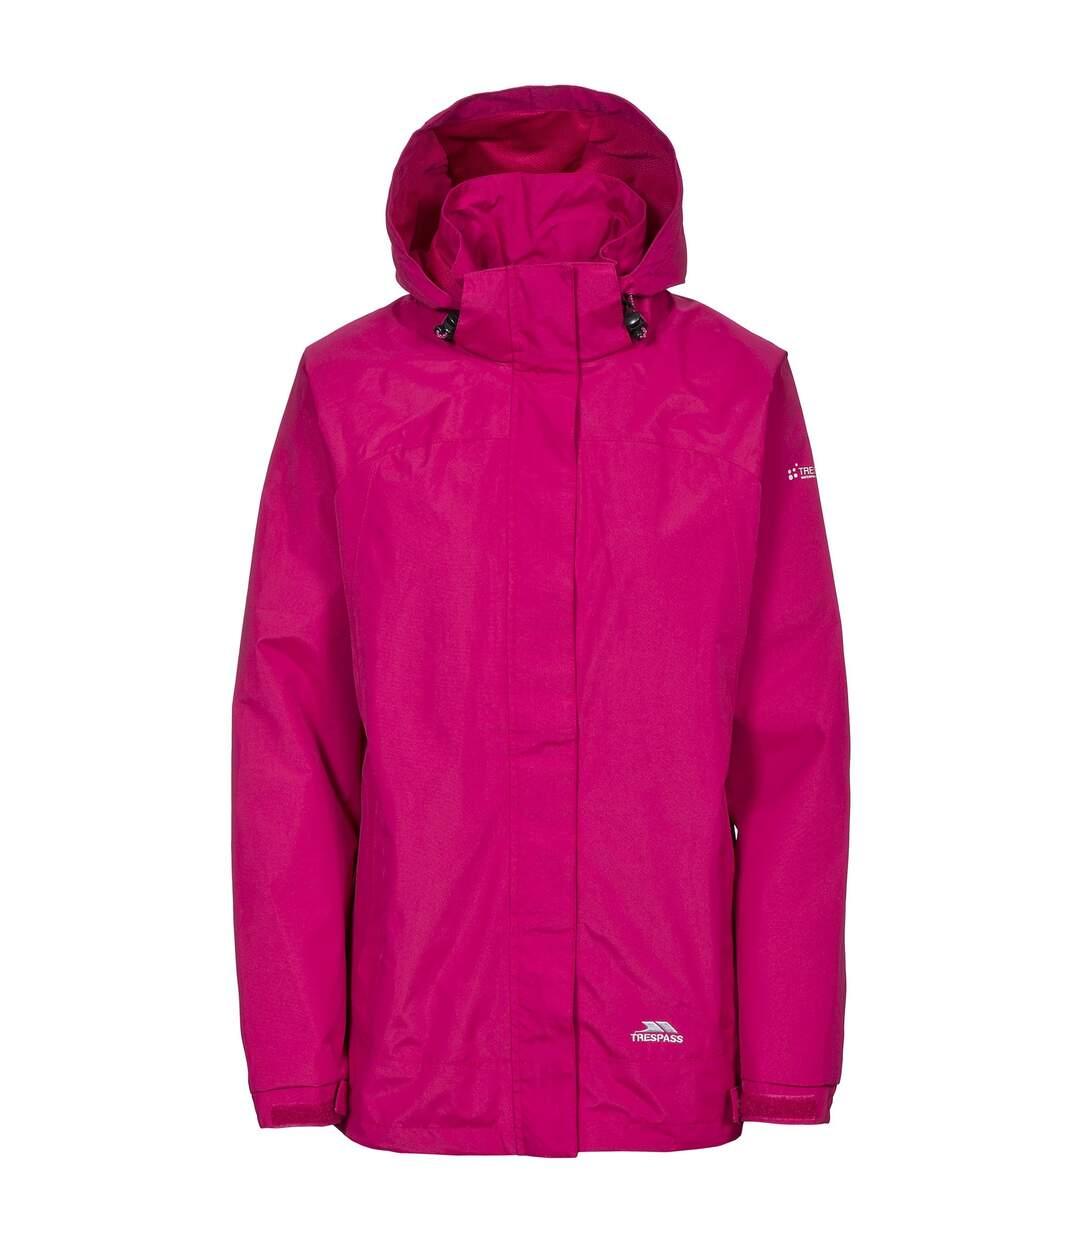 Trespass Womens/Ladies Nasu II Waterproof Shell Jacket (Cerise) - UTTP3377